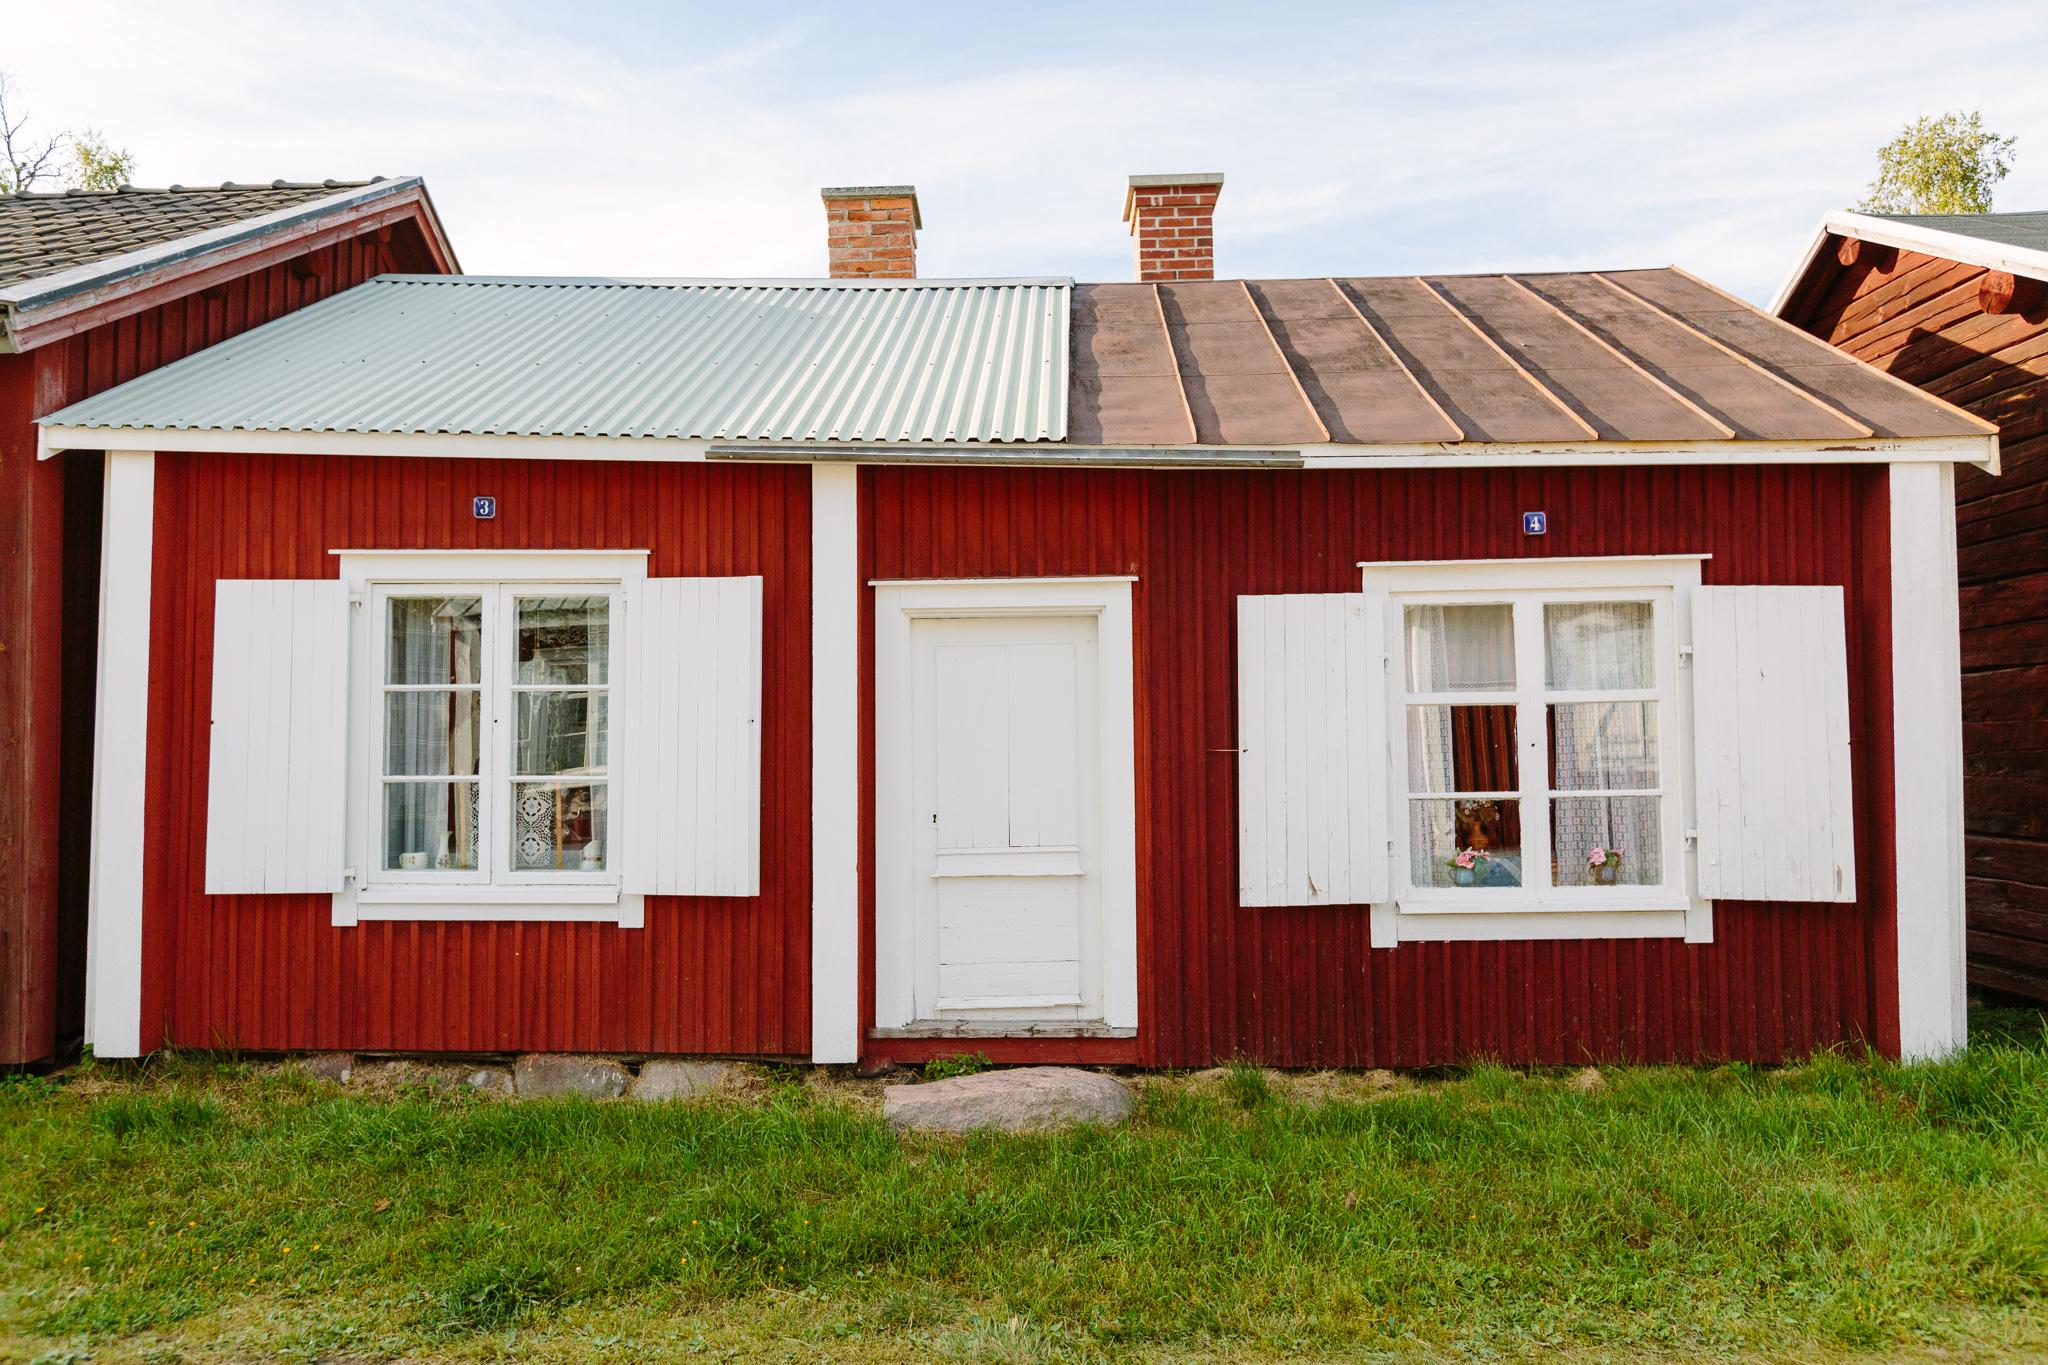 Sweden_Lulea_blogselects_2016_jenniferleahyphotography-008.jpg